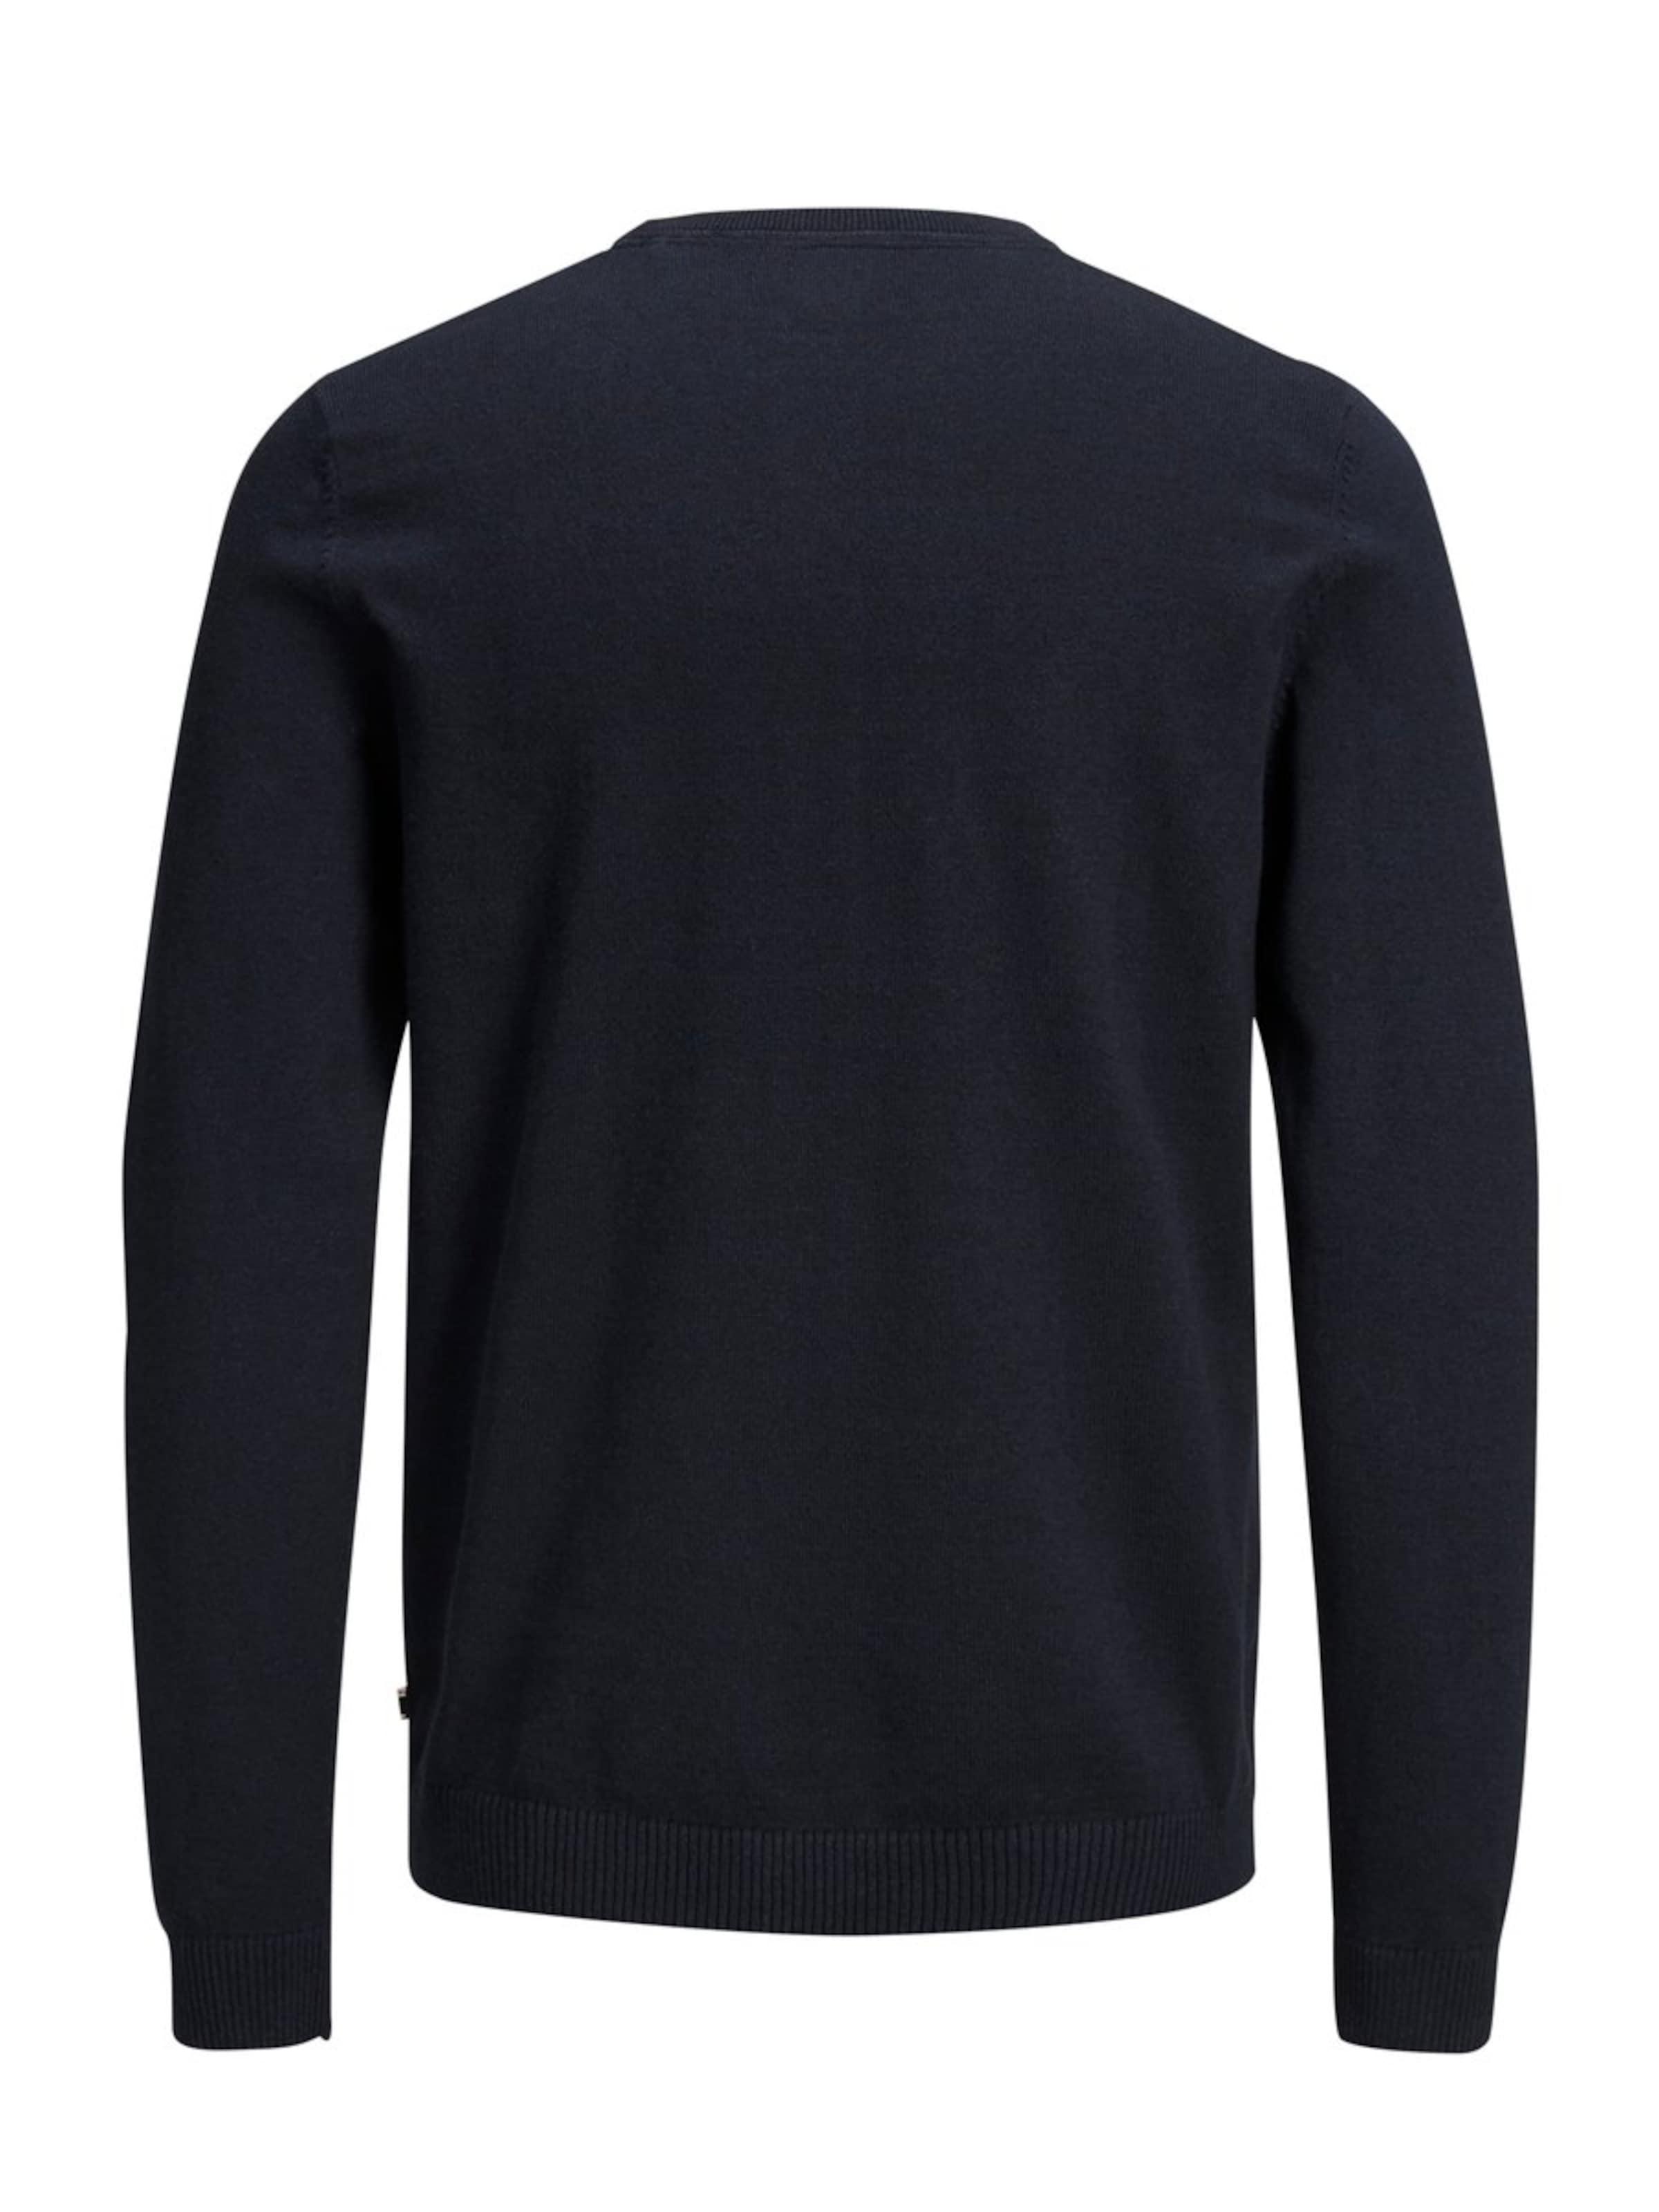 Jones Jackamp; Size Basic Pullover Plus In Navy I6ybgYf7vm